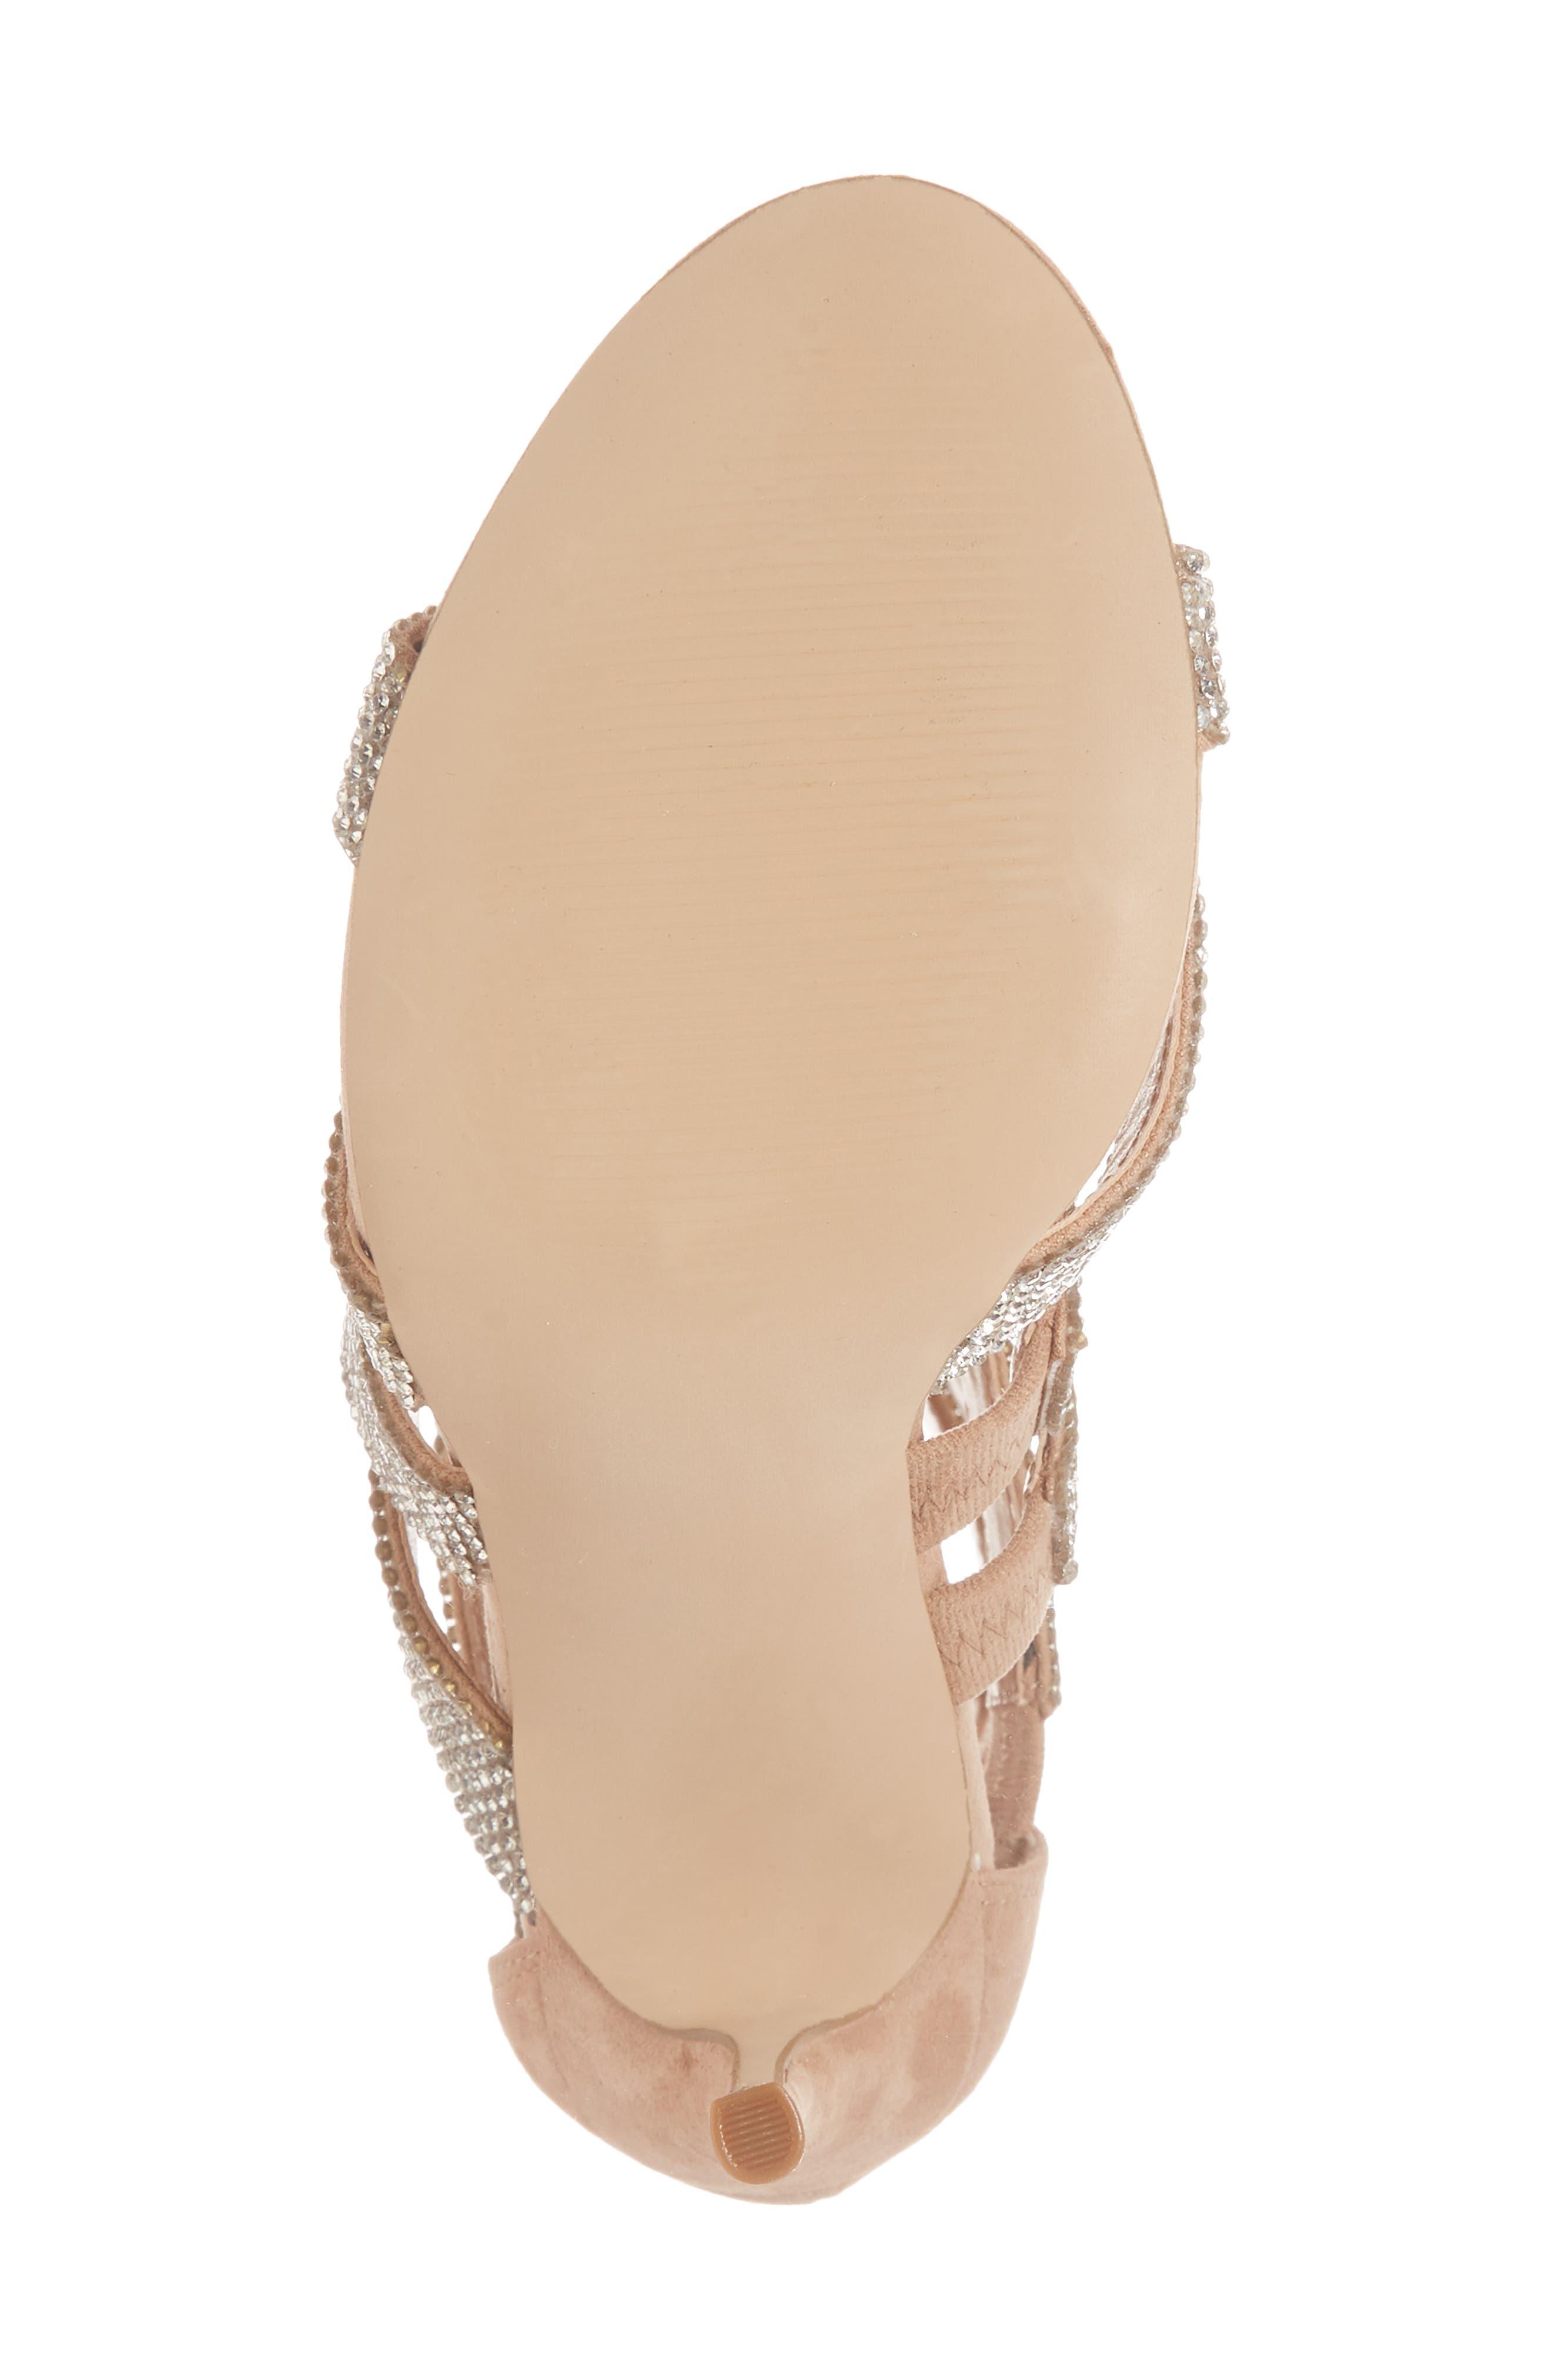 Malika Crystal Embellished Sandal,                             Alternate thumbnail 4, color,                             Rhinestone